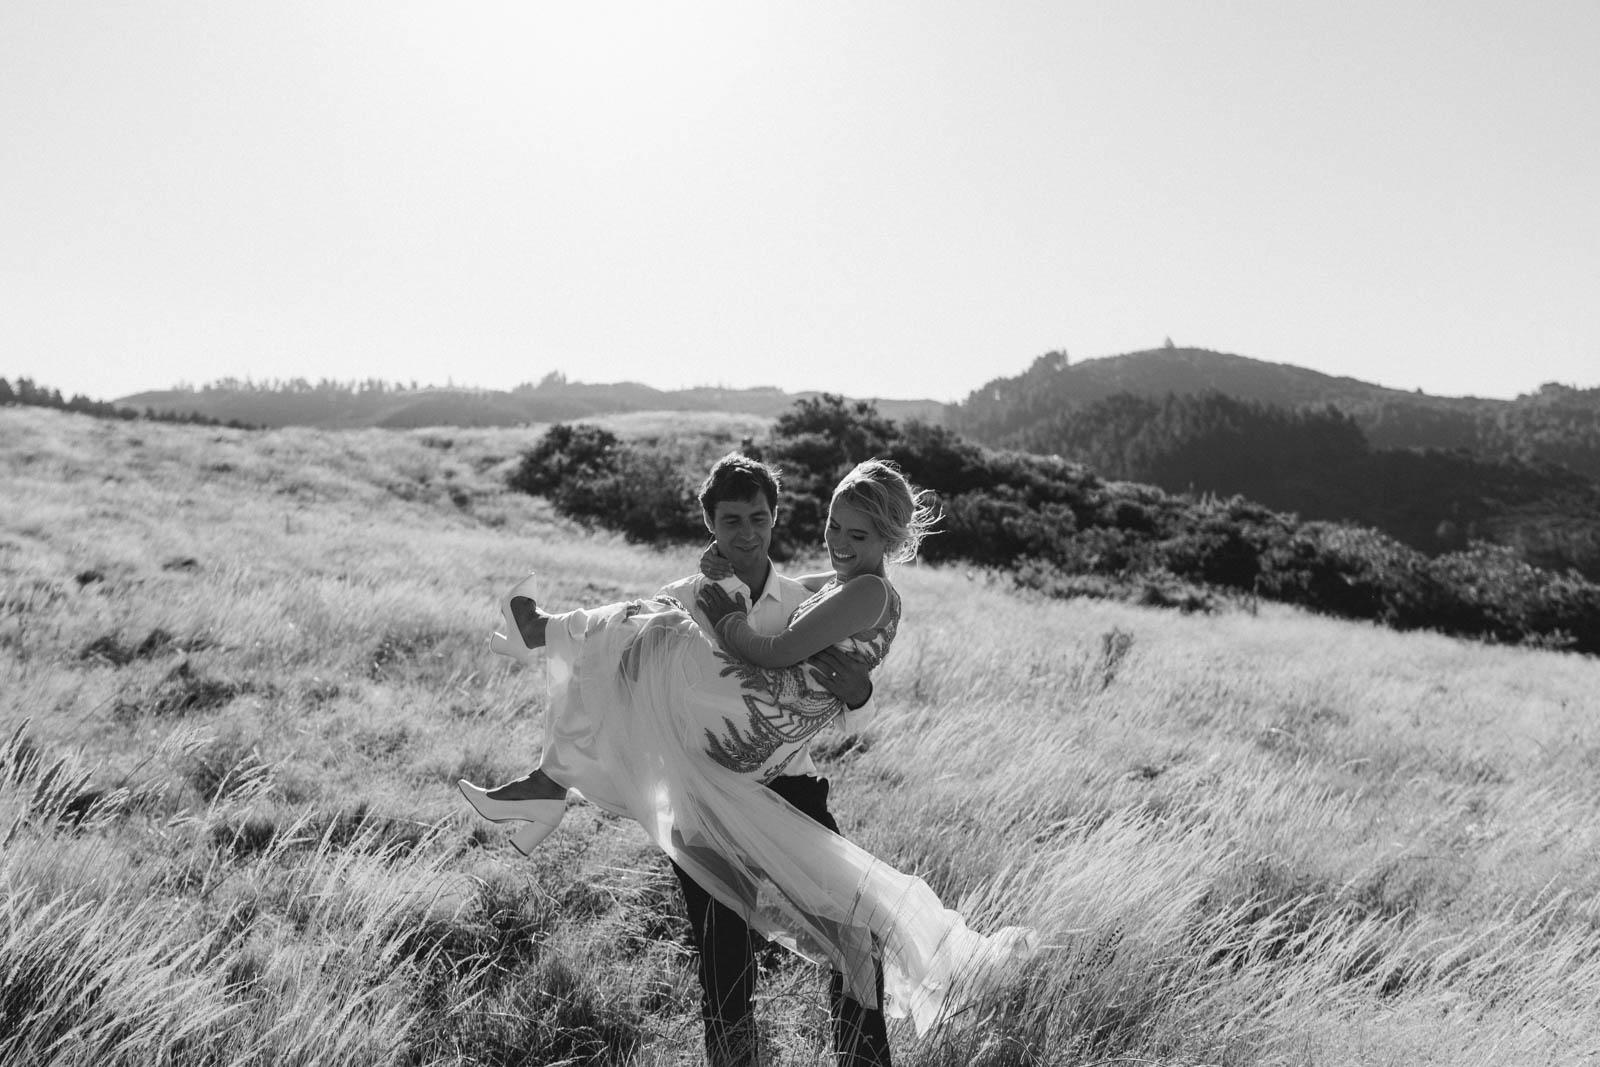 newfound-l-i-coromandel-wedding-photographer-1813-A9_04571